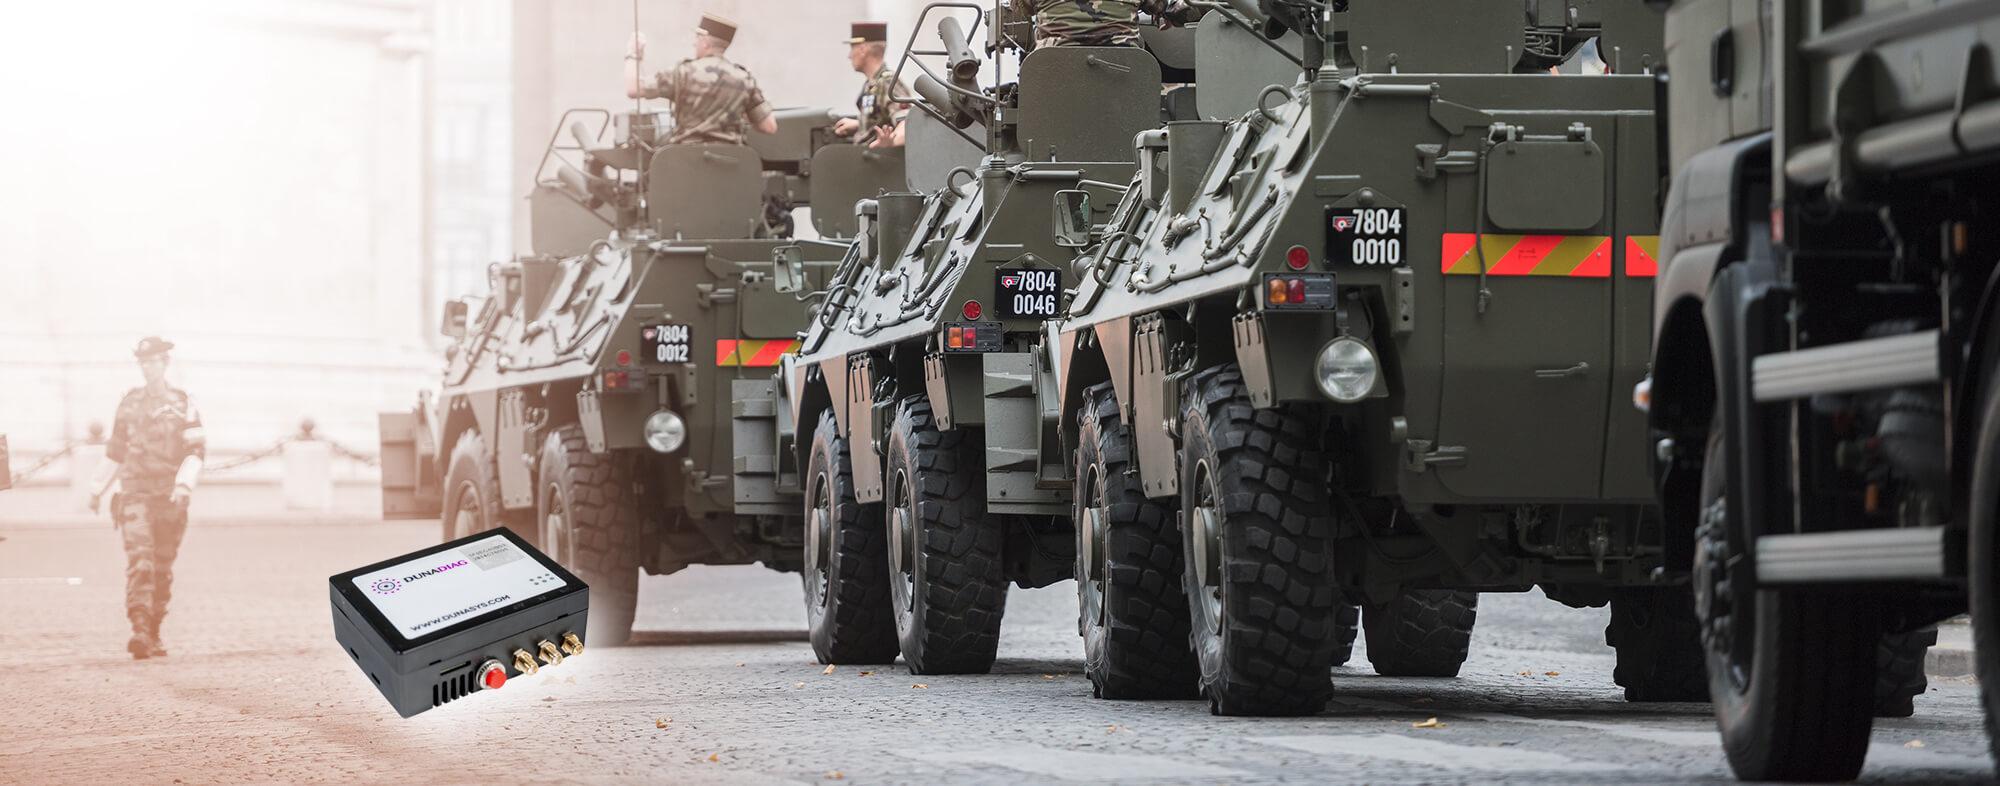 Véhicules militaires